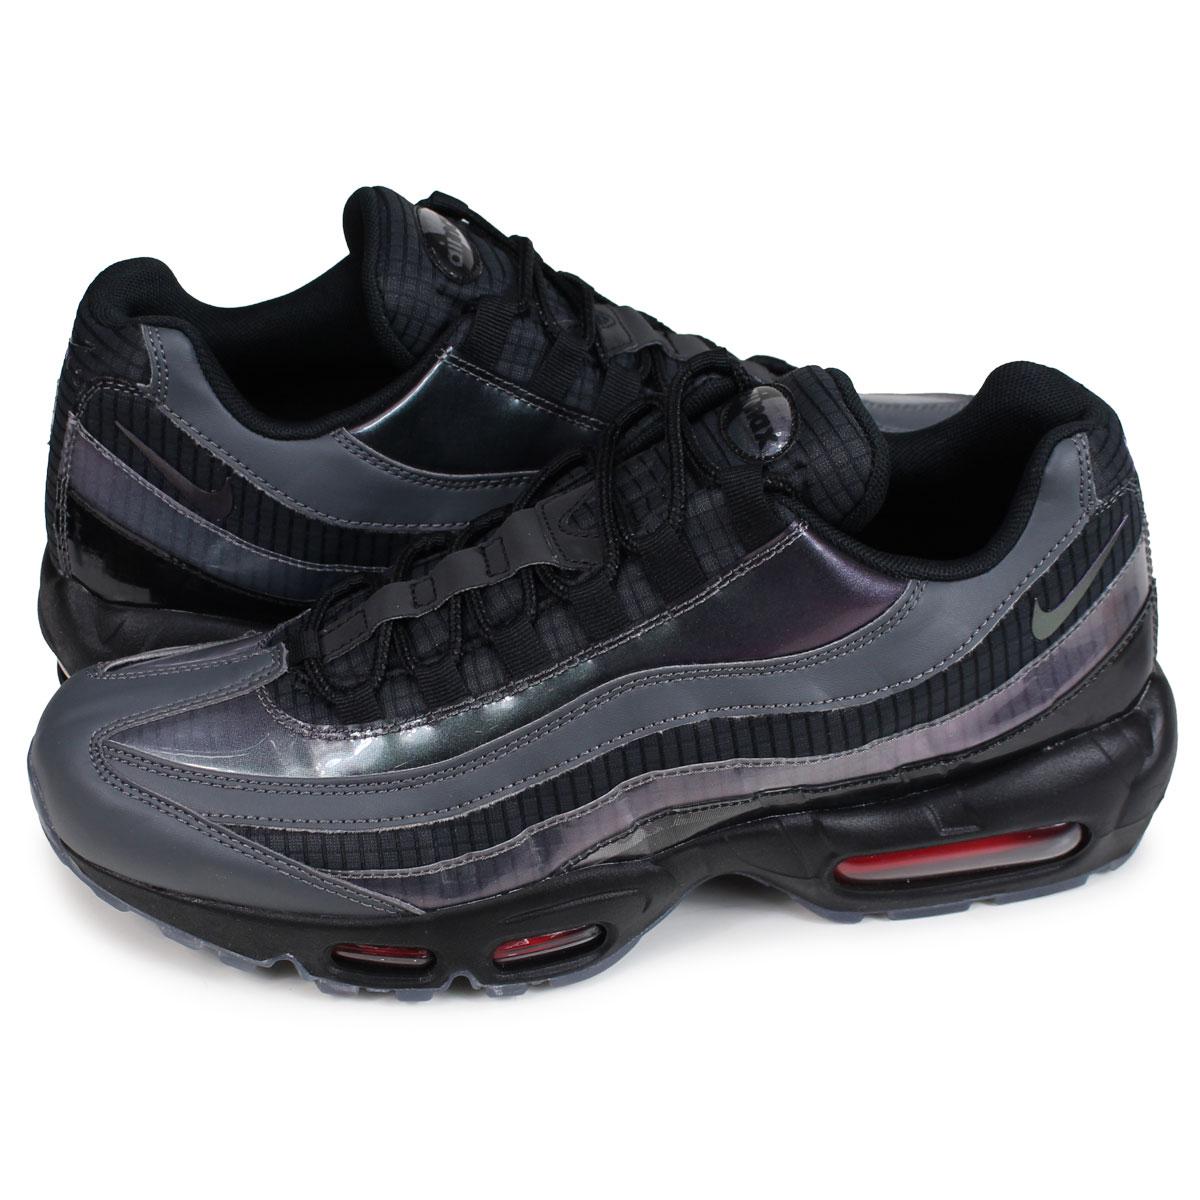 new product 2e59a 63208 Nike NIKE Air Max 95 sneakers men AIR MAX 95 LV8 black AO2450-001 ...